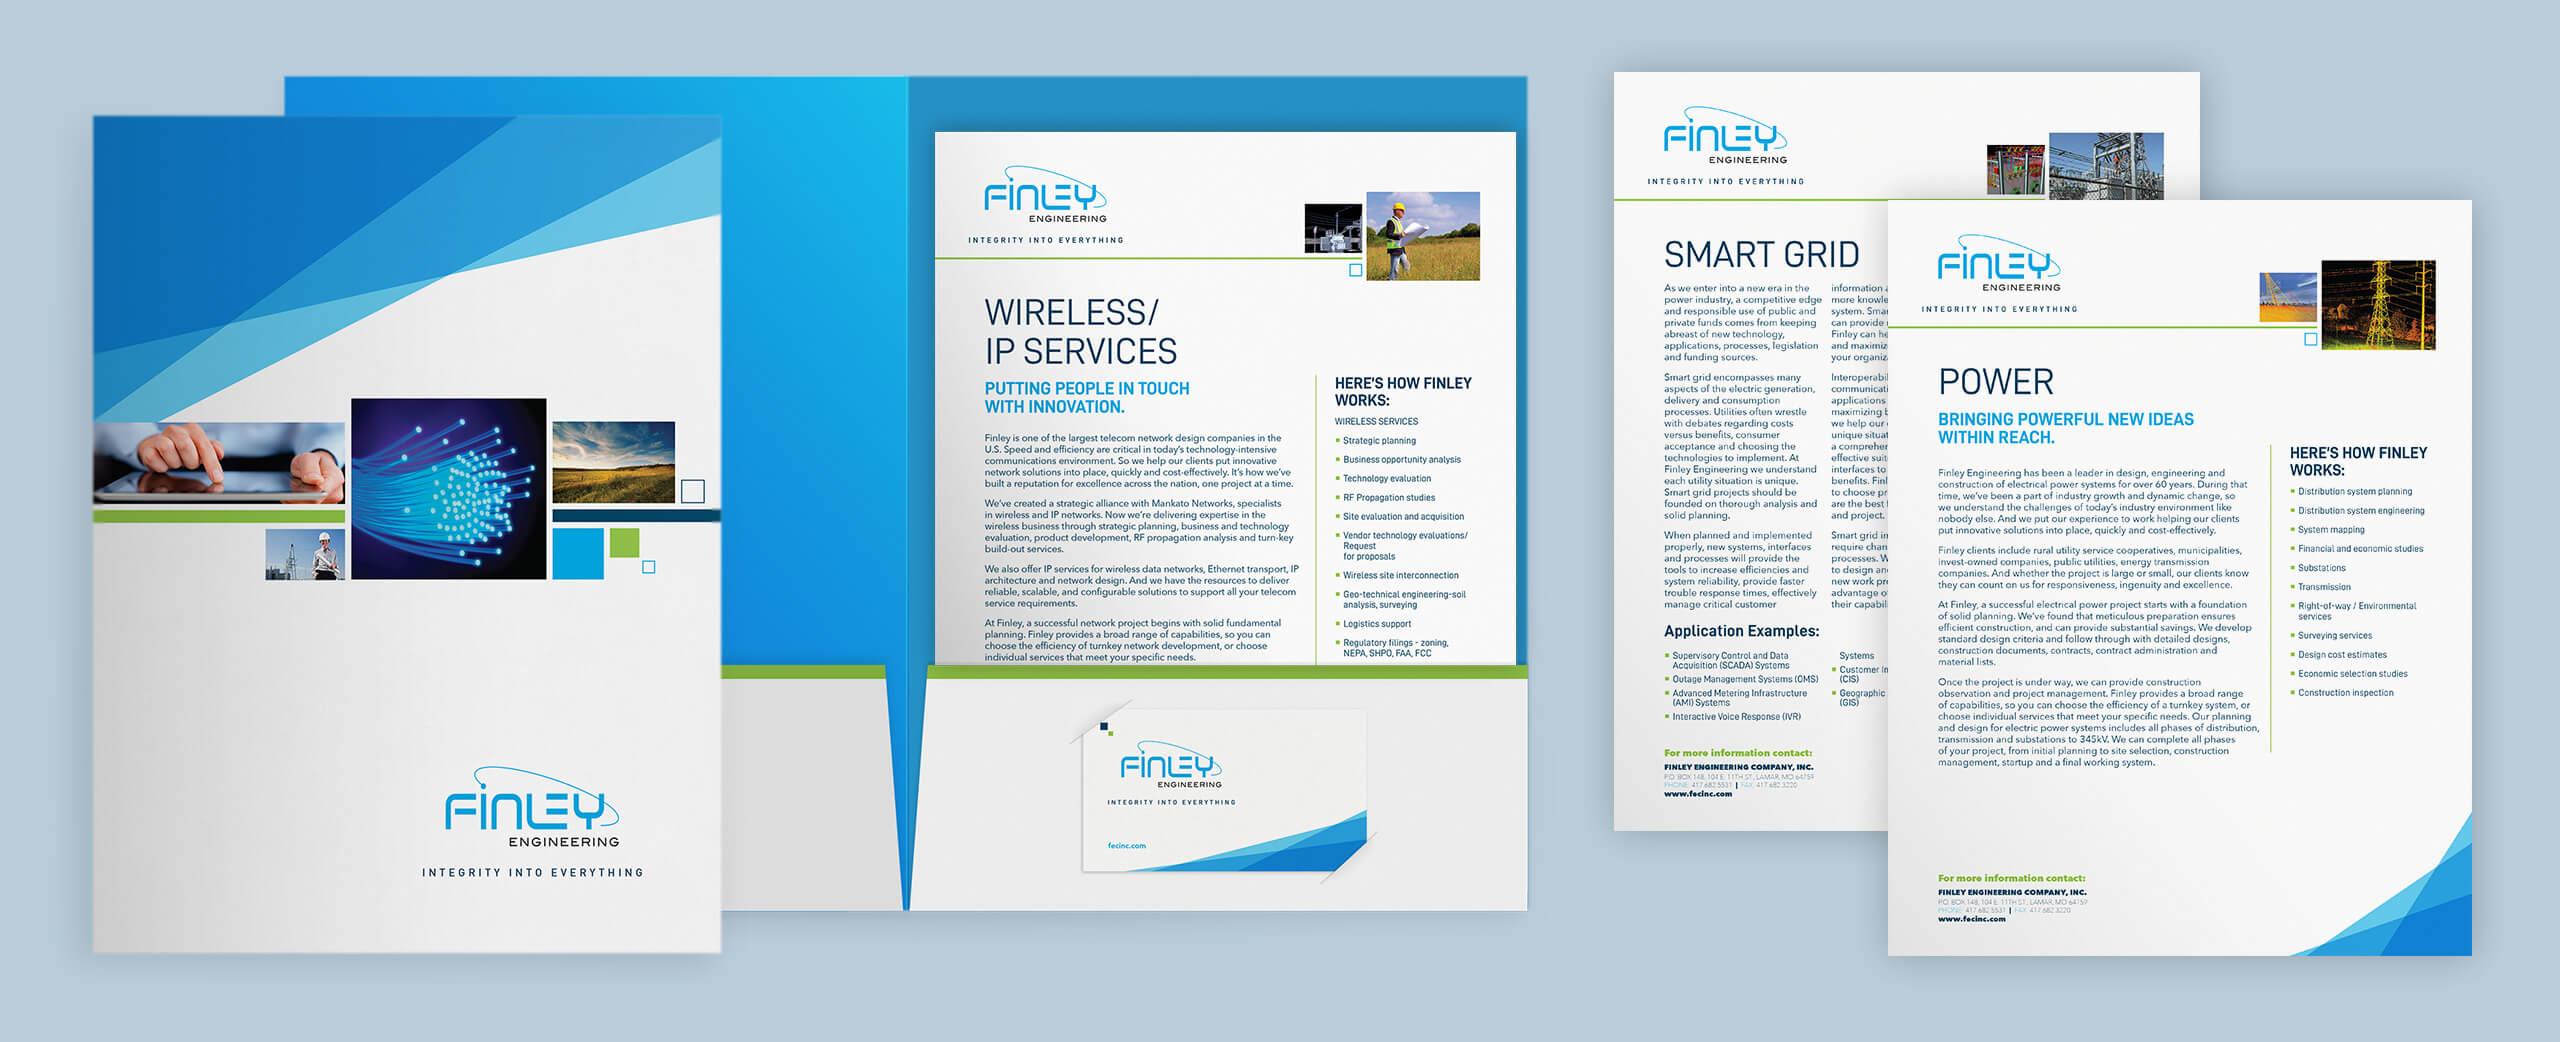 dmg-marketing-collateral-finley-presentation-folder